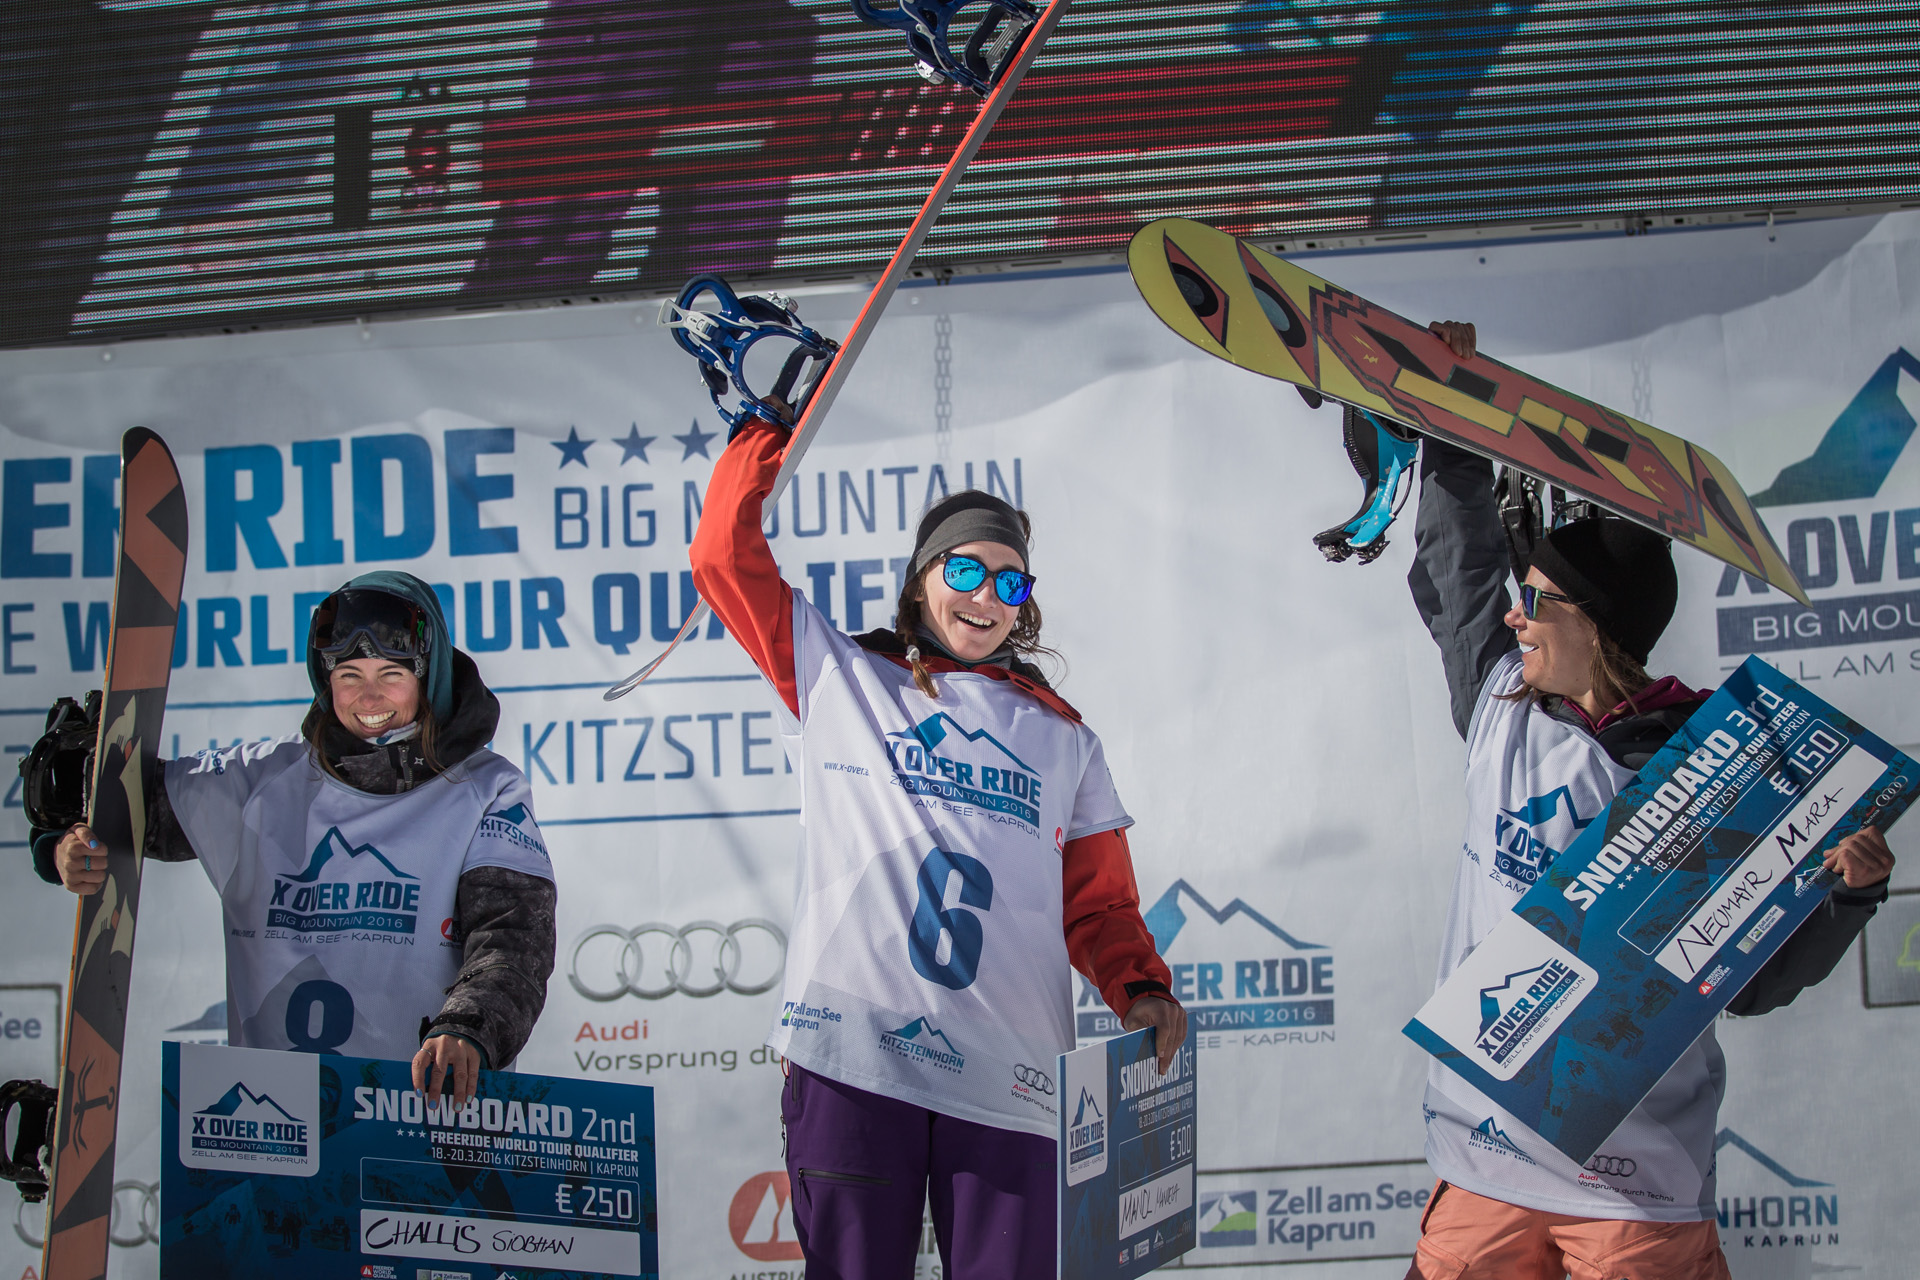 Das Podium der Ladies: Mara Neumayr, Manuela Mandl und Siobhan Challis - Foto: Mia Maria Knoll